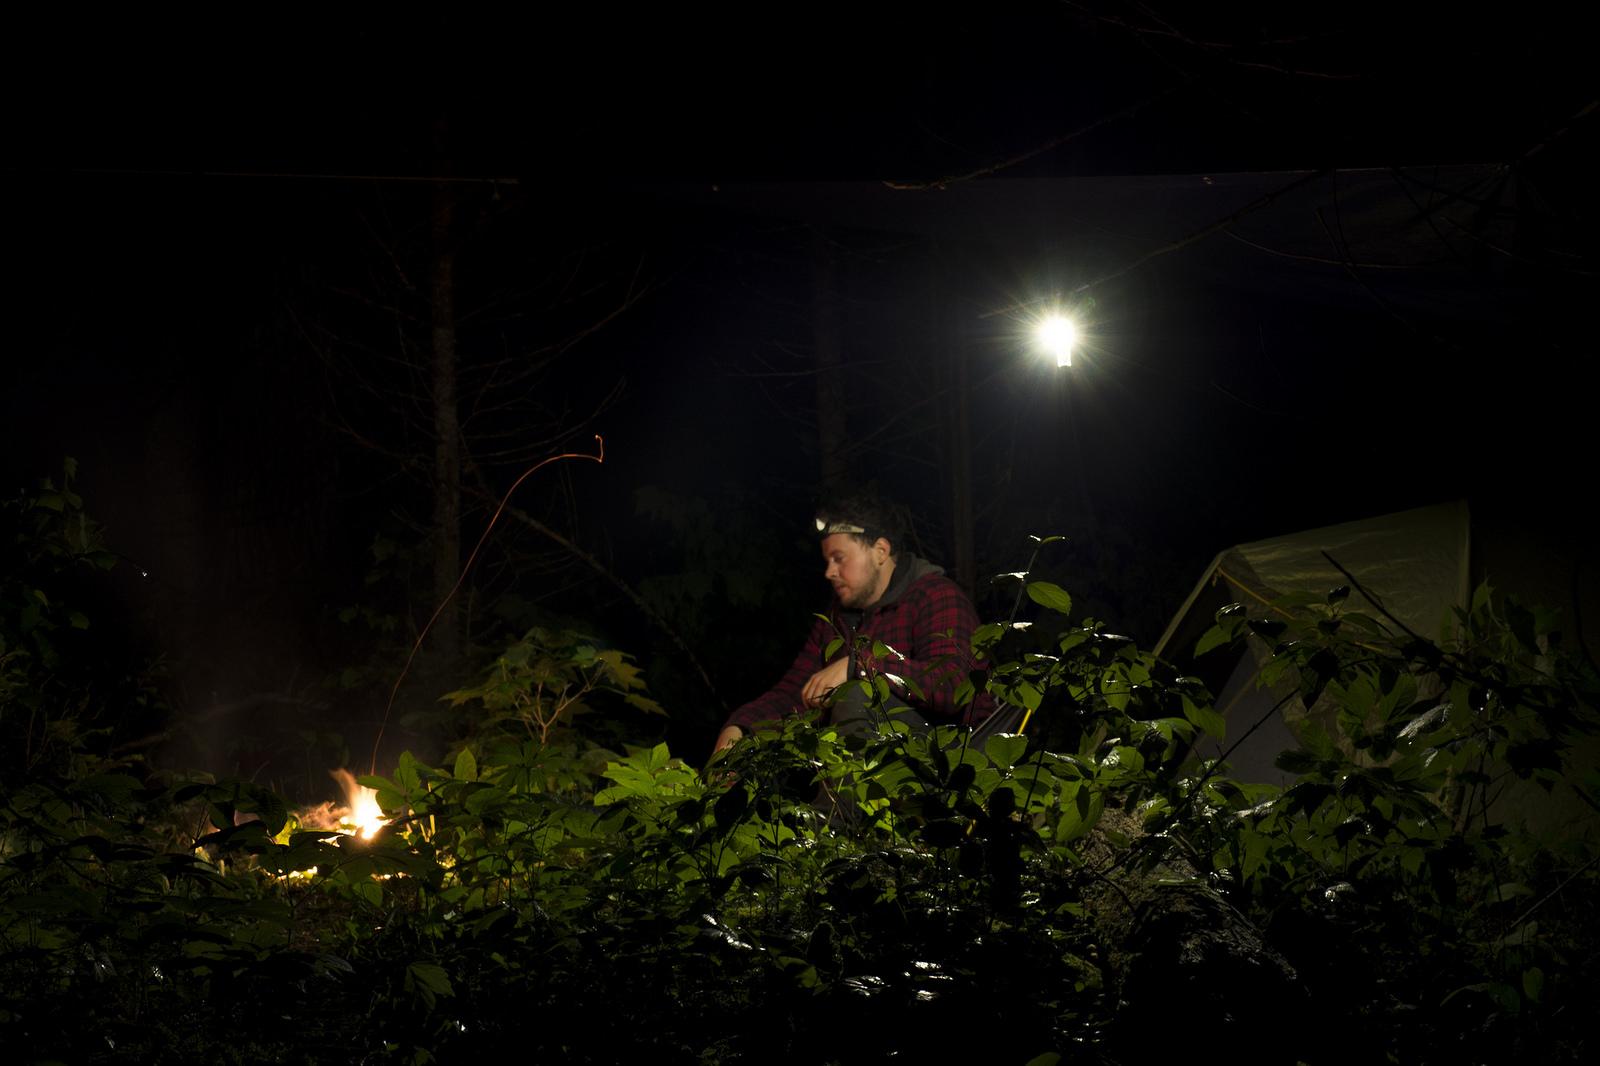 Solo camping: pretty neat. (Goodson)